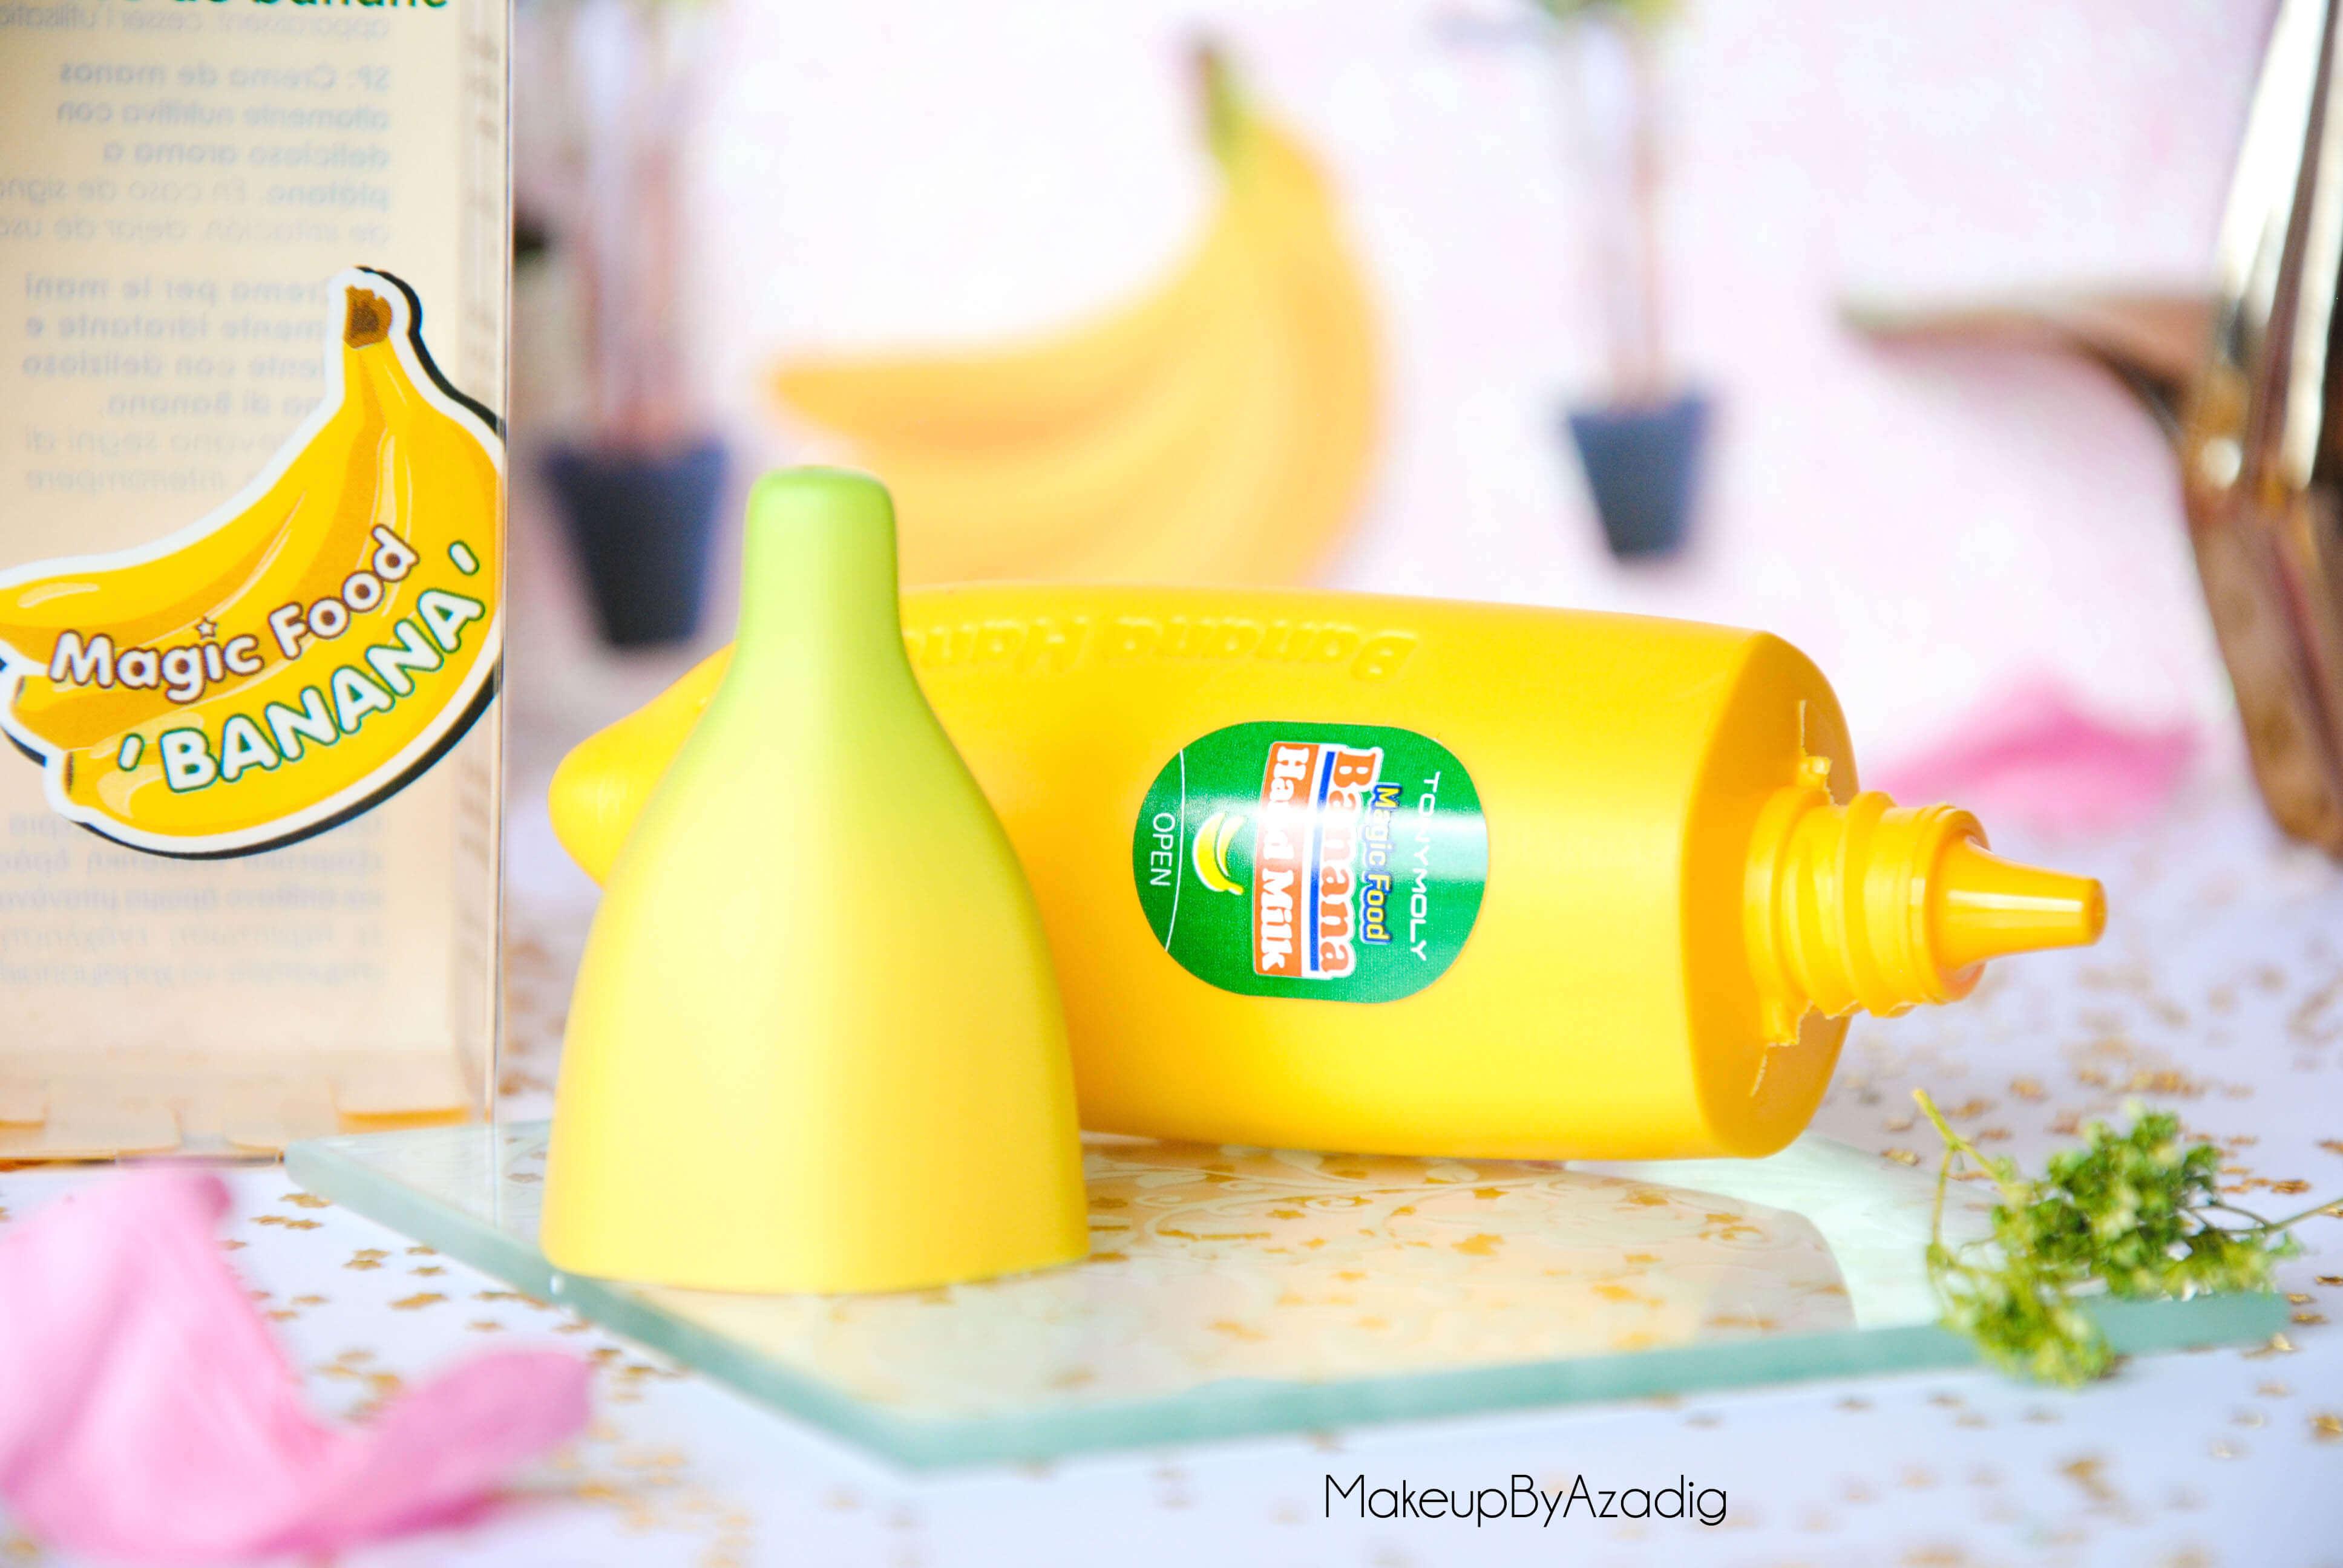 magic-food-banana-hand-milk-tonymoly-banane-creme-main-hand-cream-review-revue-paris-dijon-troyes-makeupbyazadig-kawai-miniutaure